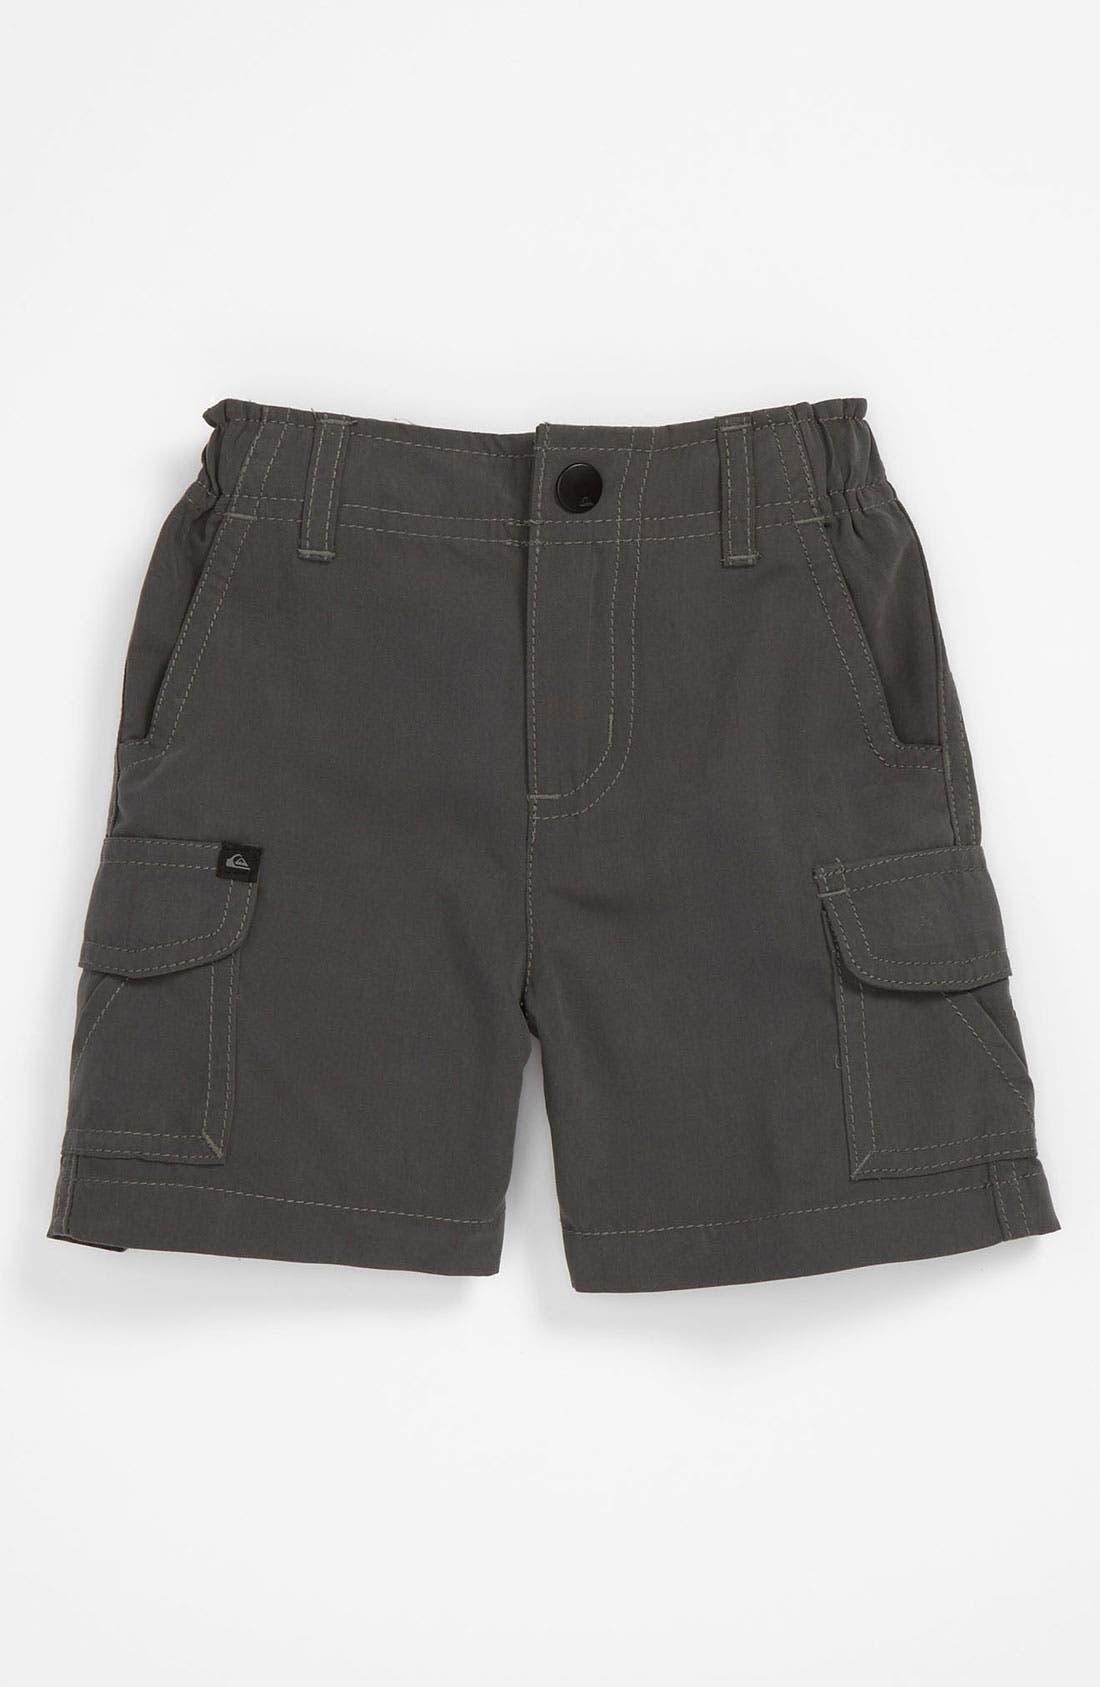 Alternate Image 1 Selected - Quiksilver 'Phofilled' Shorts (Toddler)